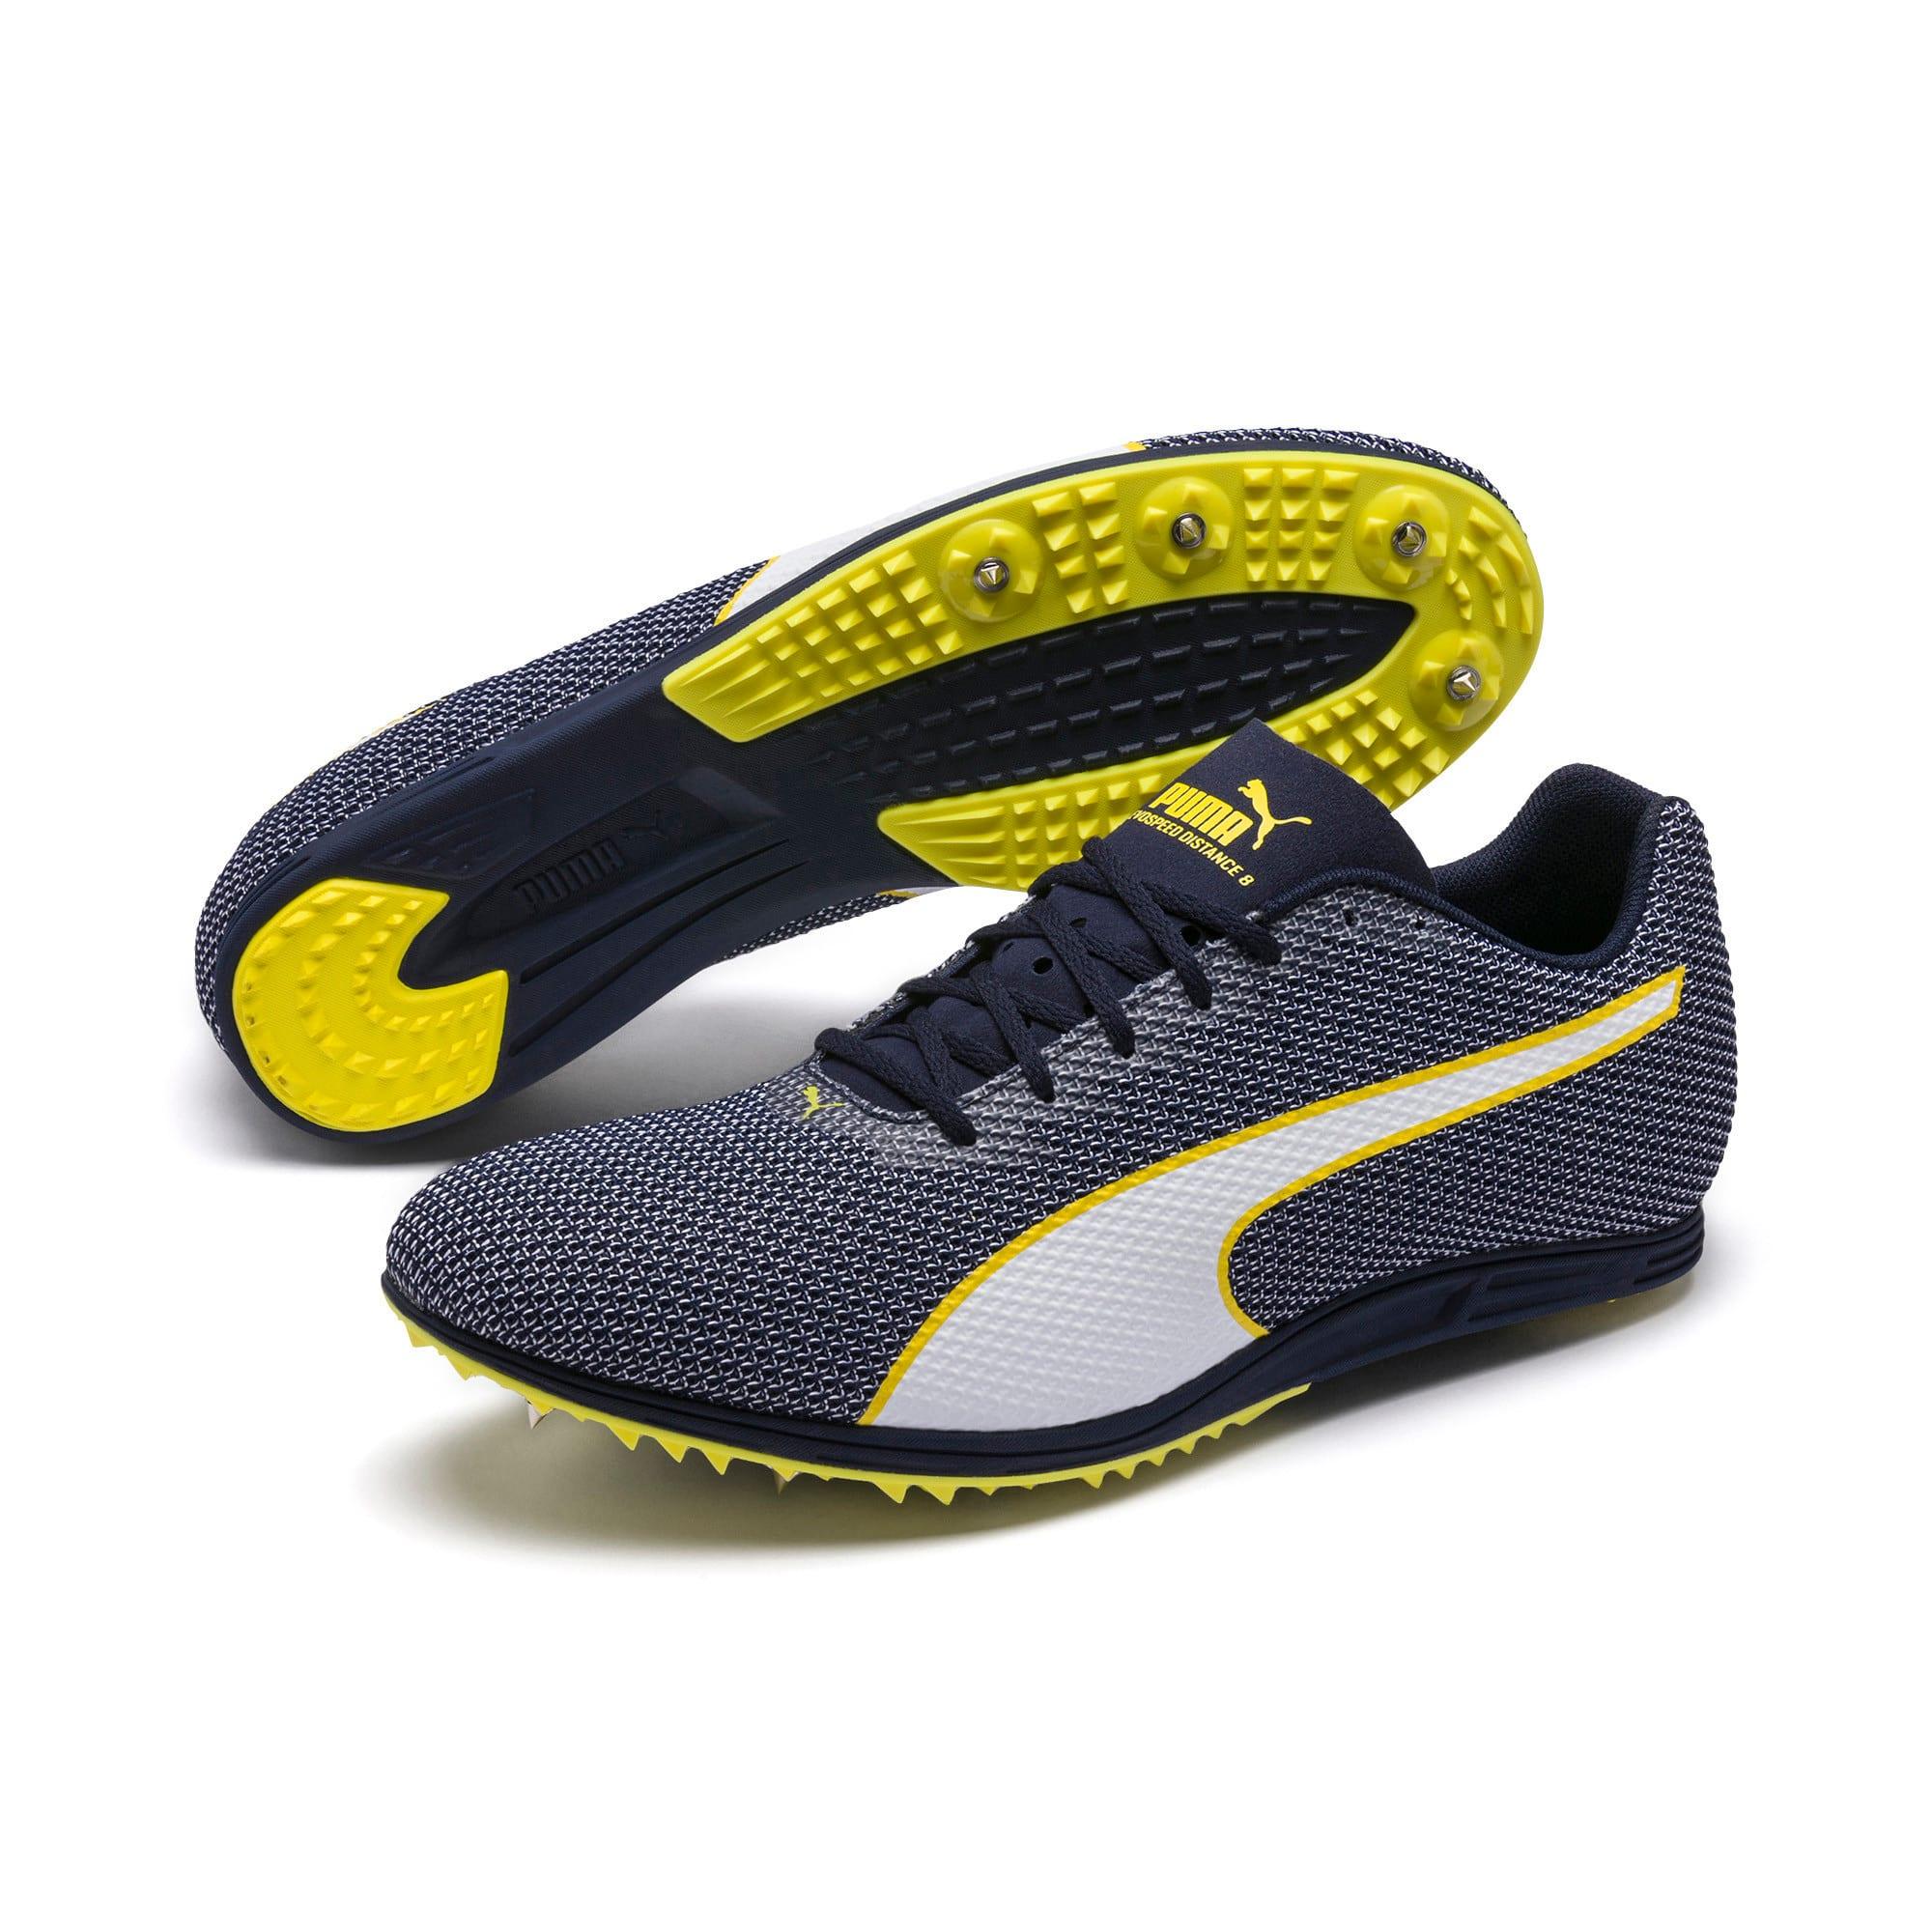 Thumbnail 6 of evoSPEED Distance 8 Men's Running Shoes, Peacoat-Blazing Yellow, medium-IND